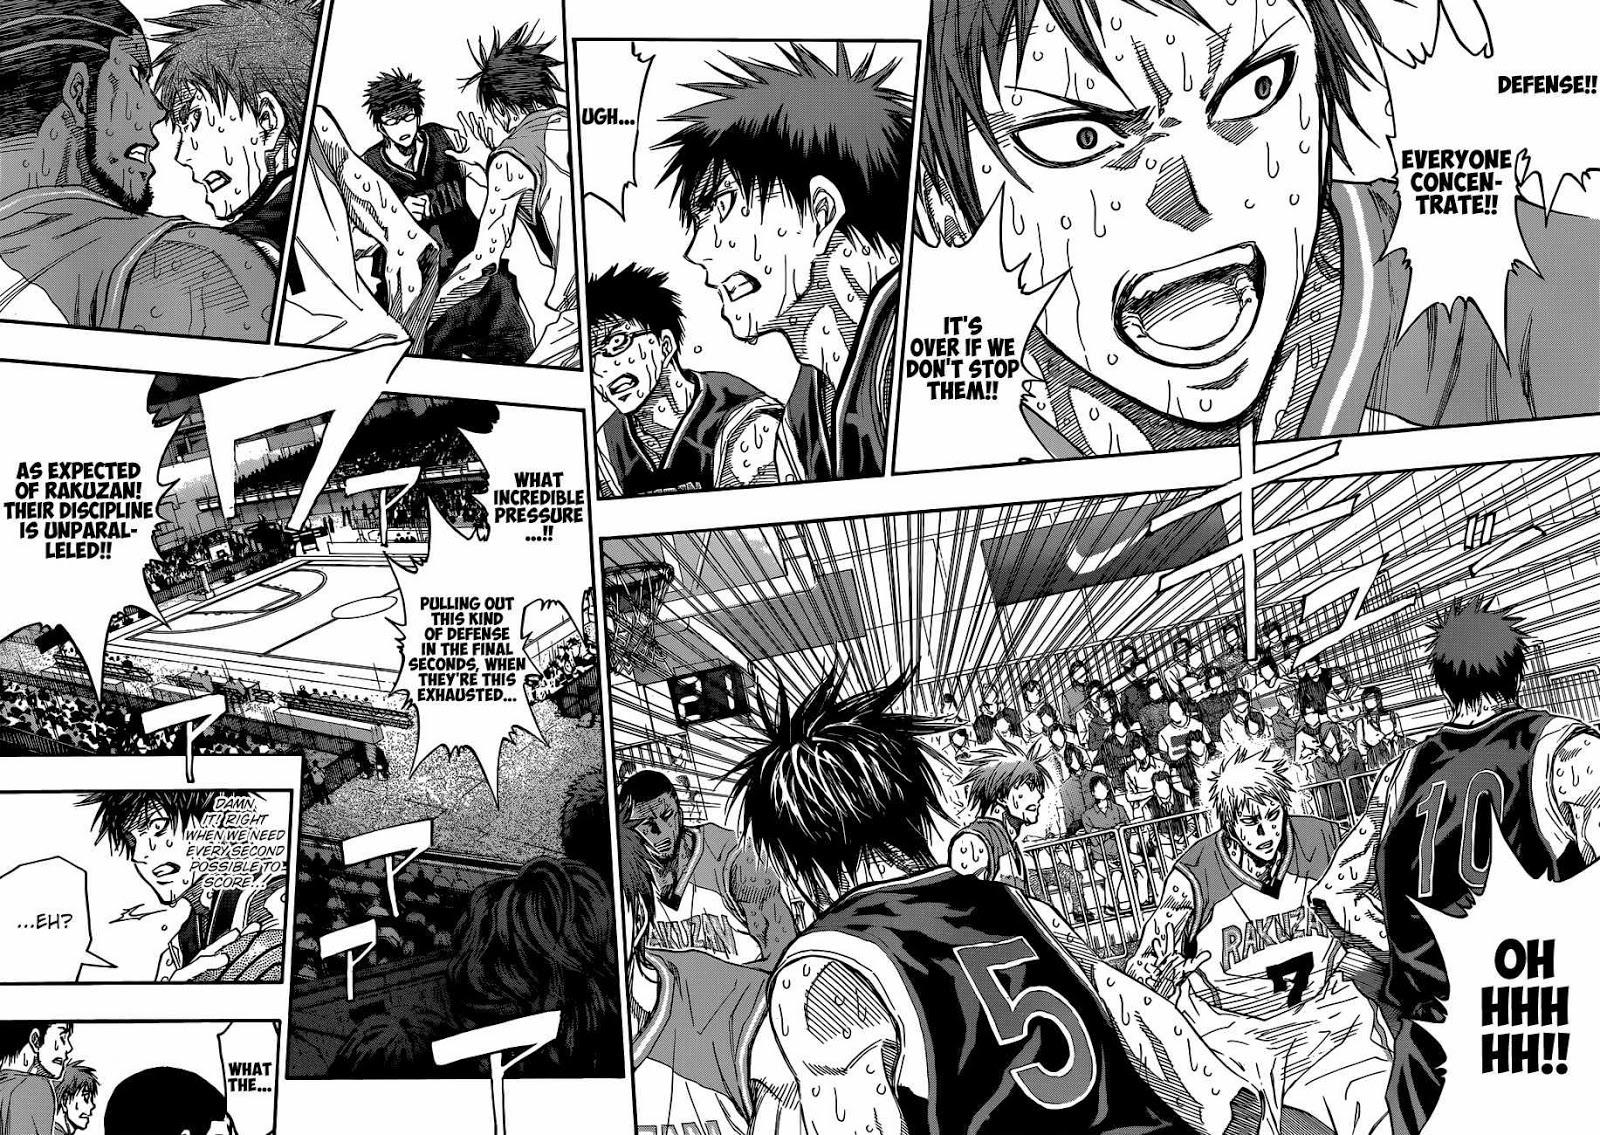 Kuroko no Basket Manga Chapter 272 - Image 02-03